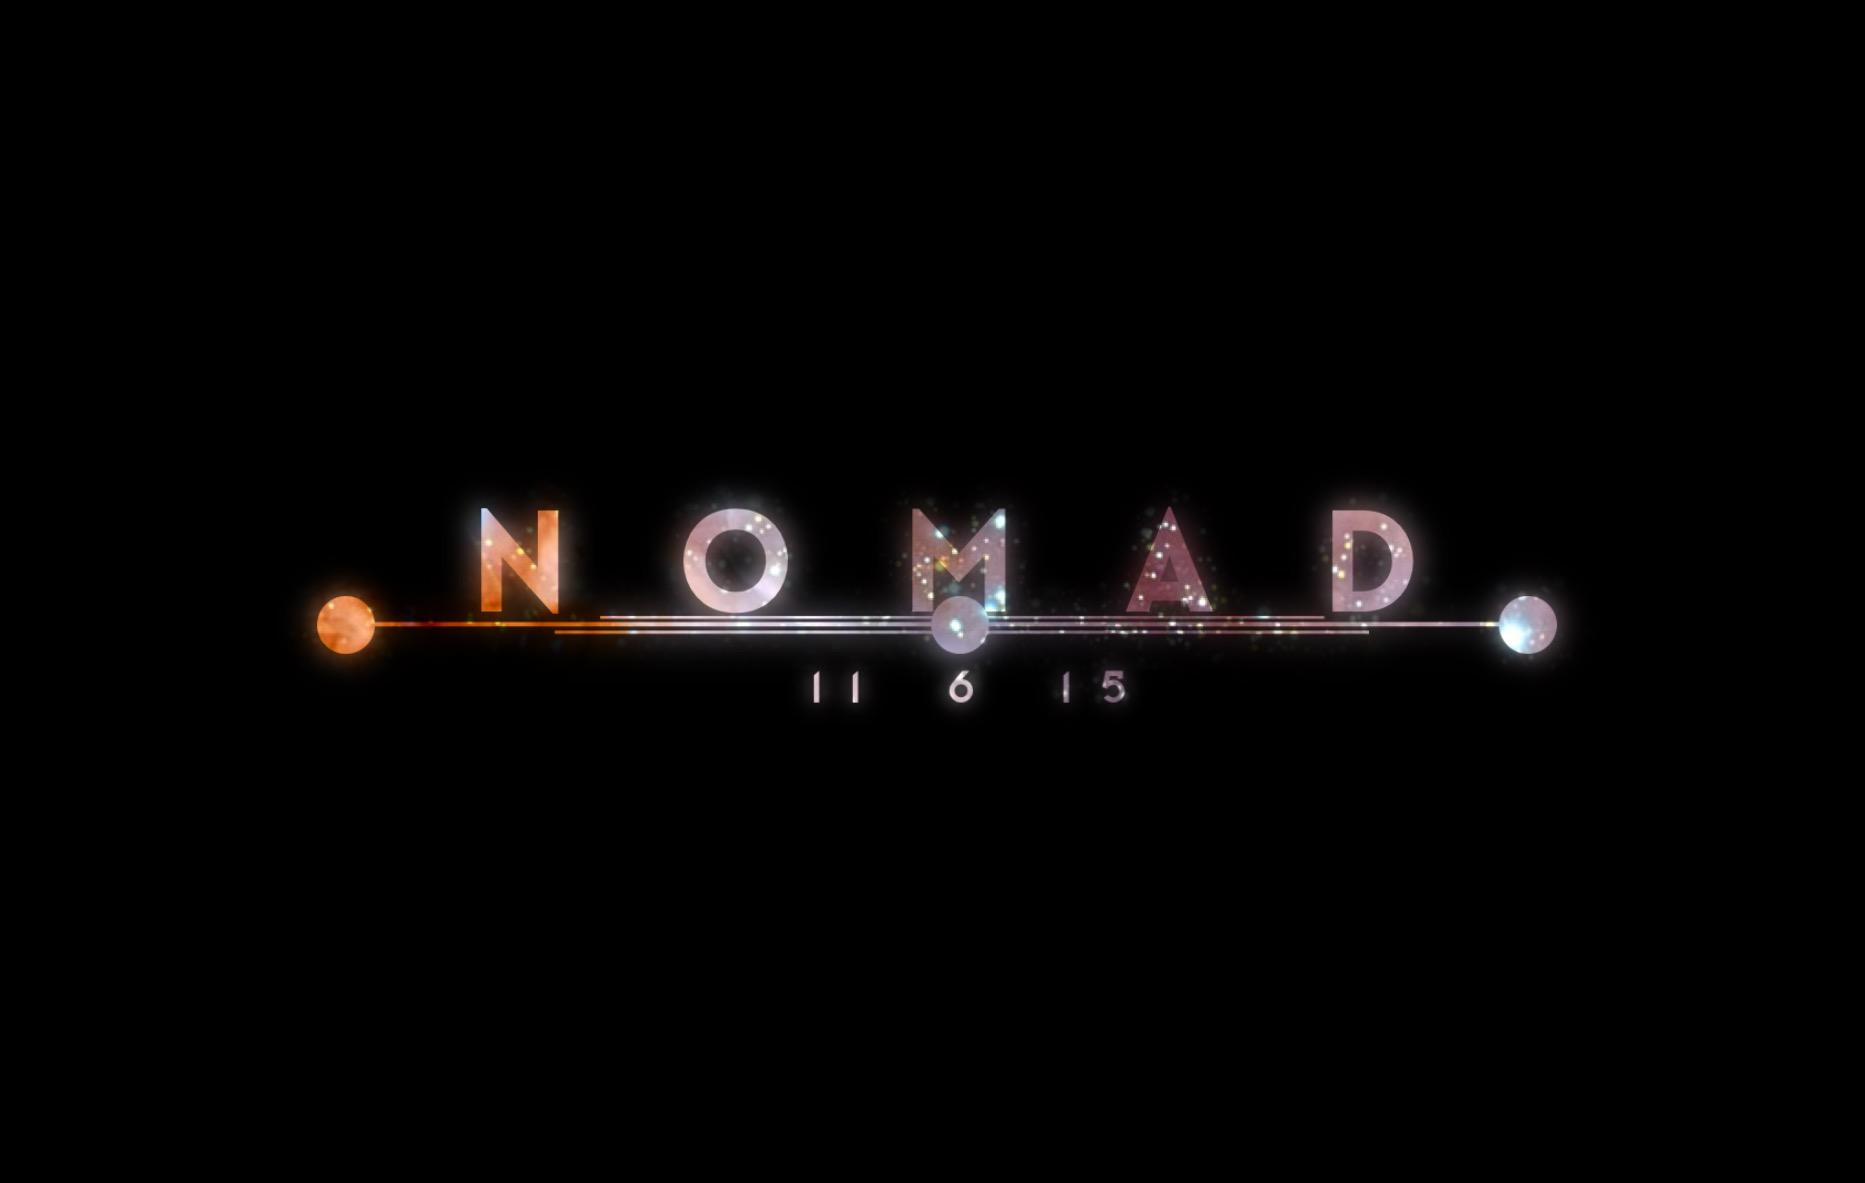 Nomad launch